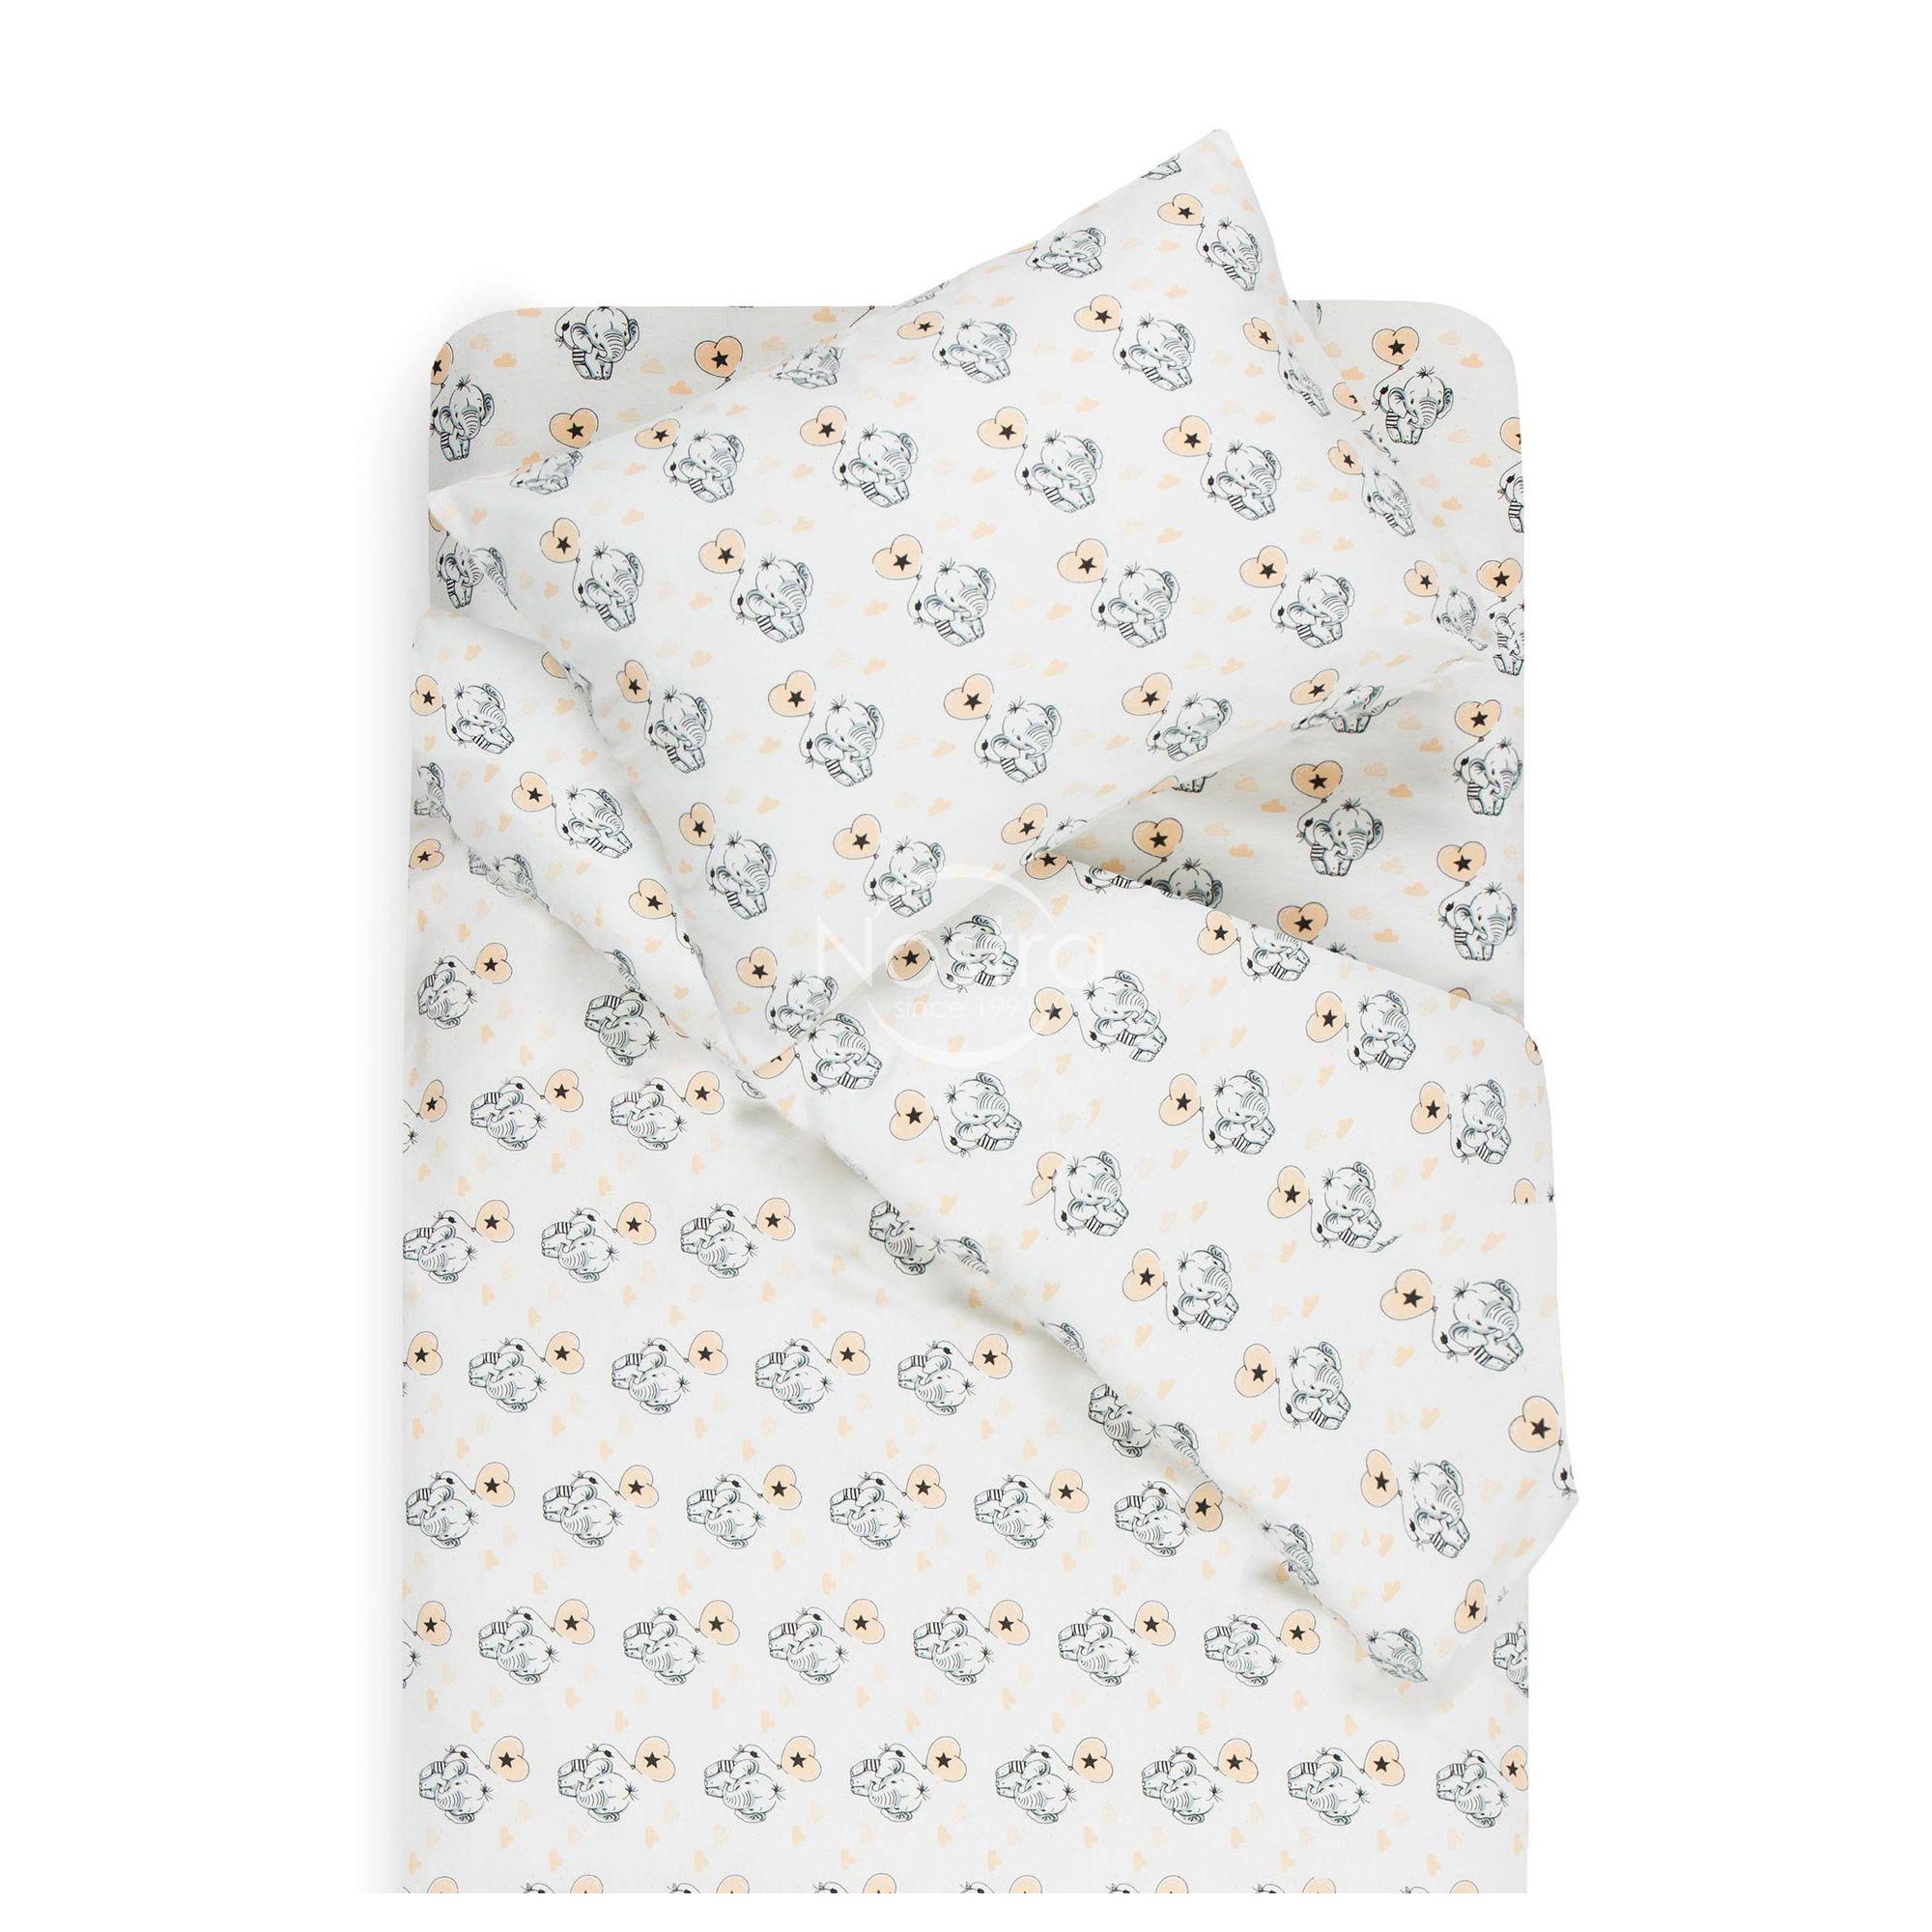 Bērnu flaneļa gultas veļa BABY ELEPHANT